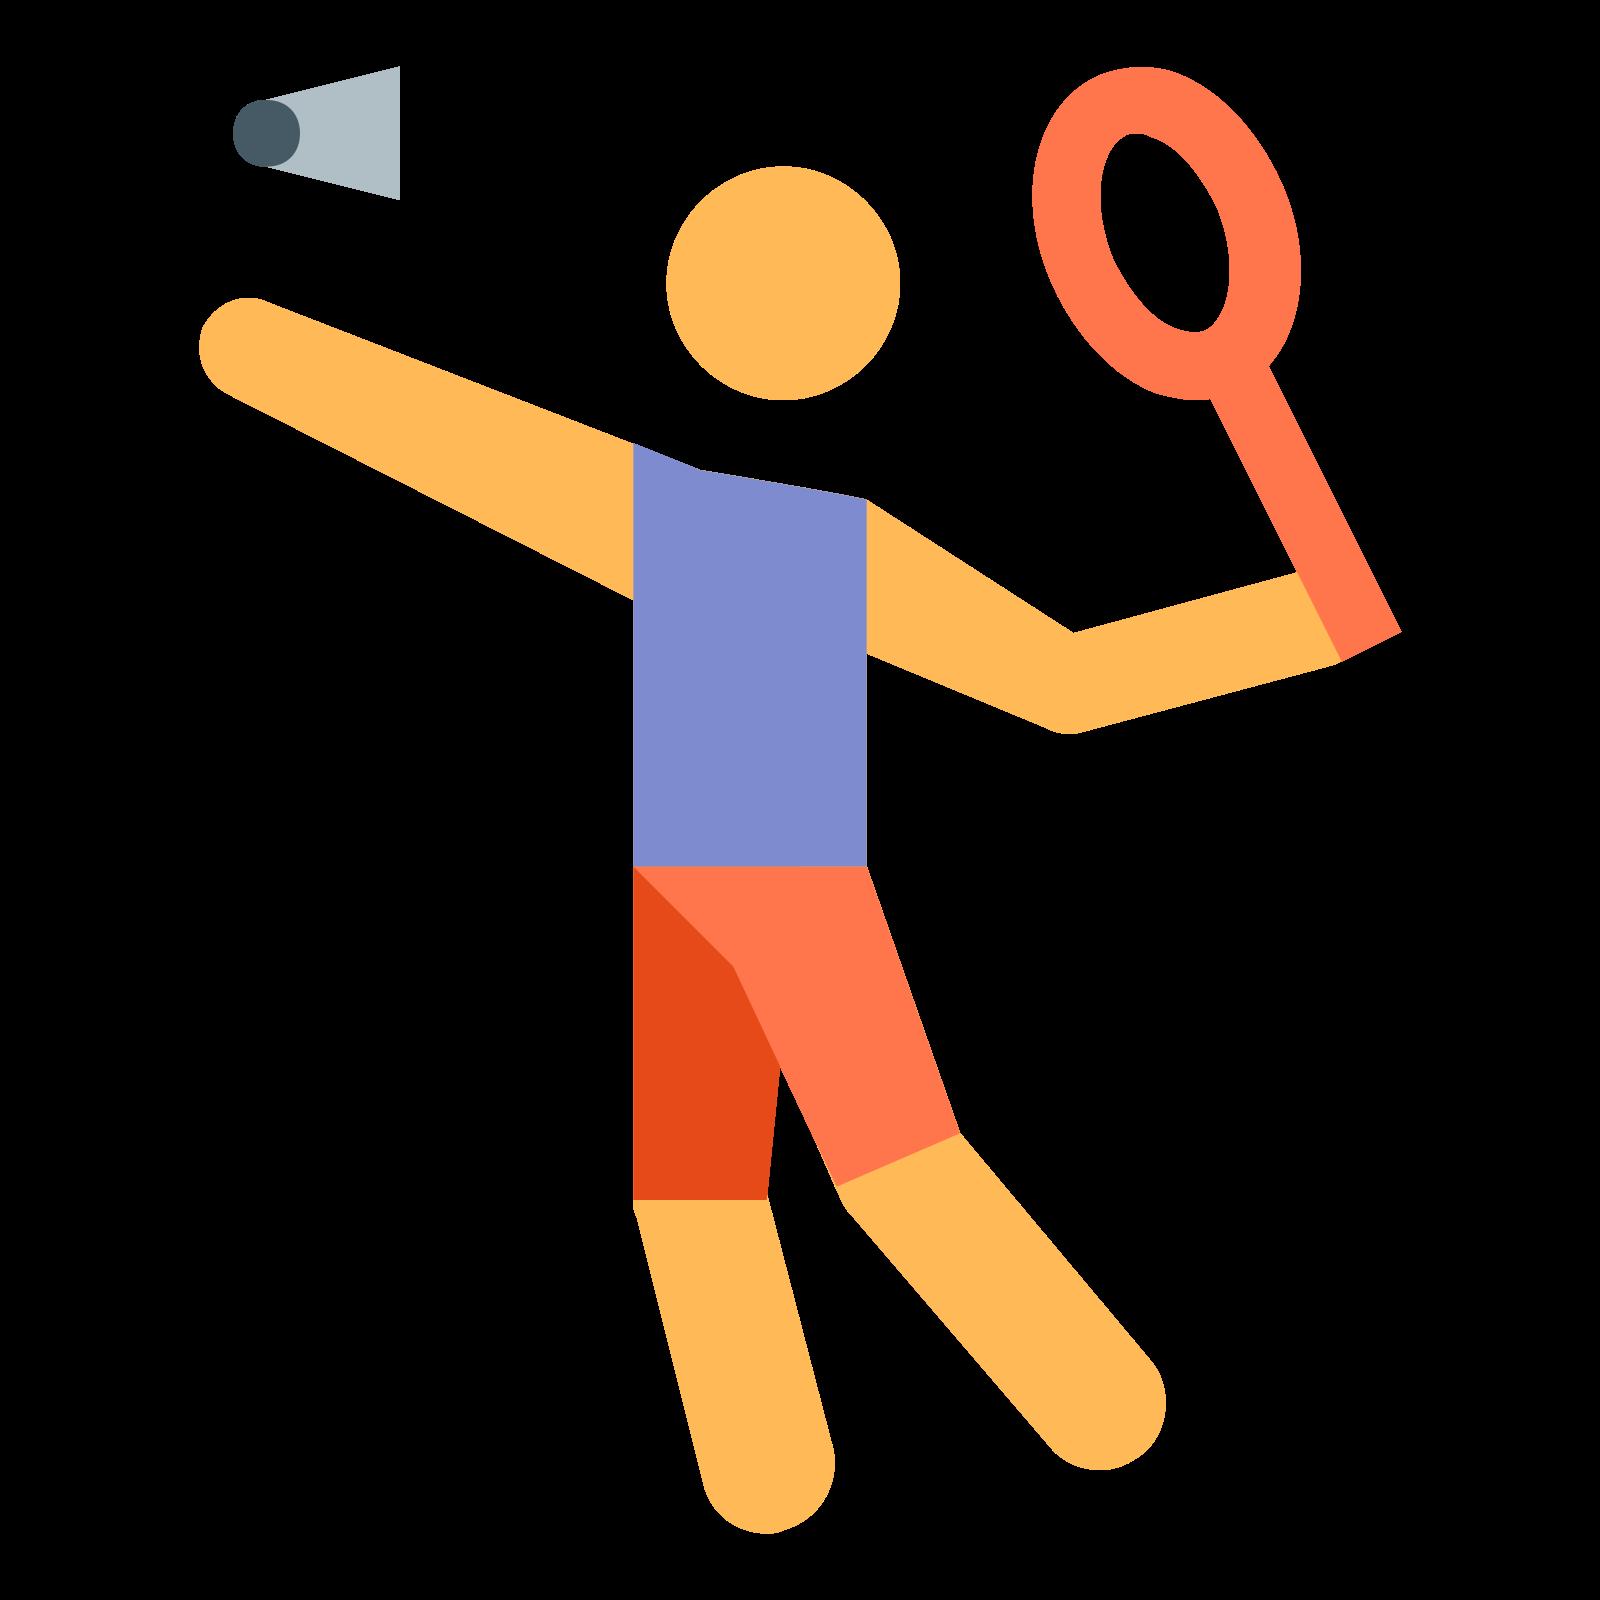 Badminton 2 icon